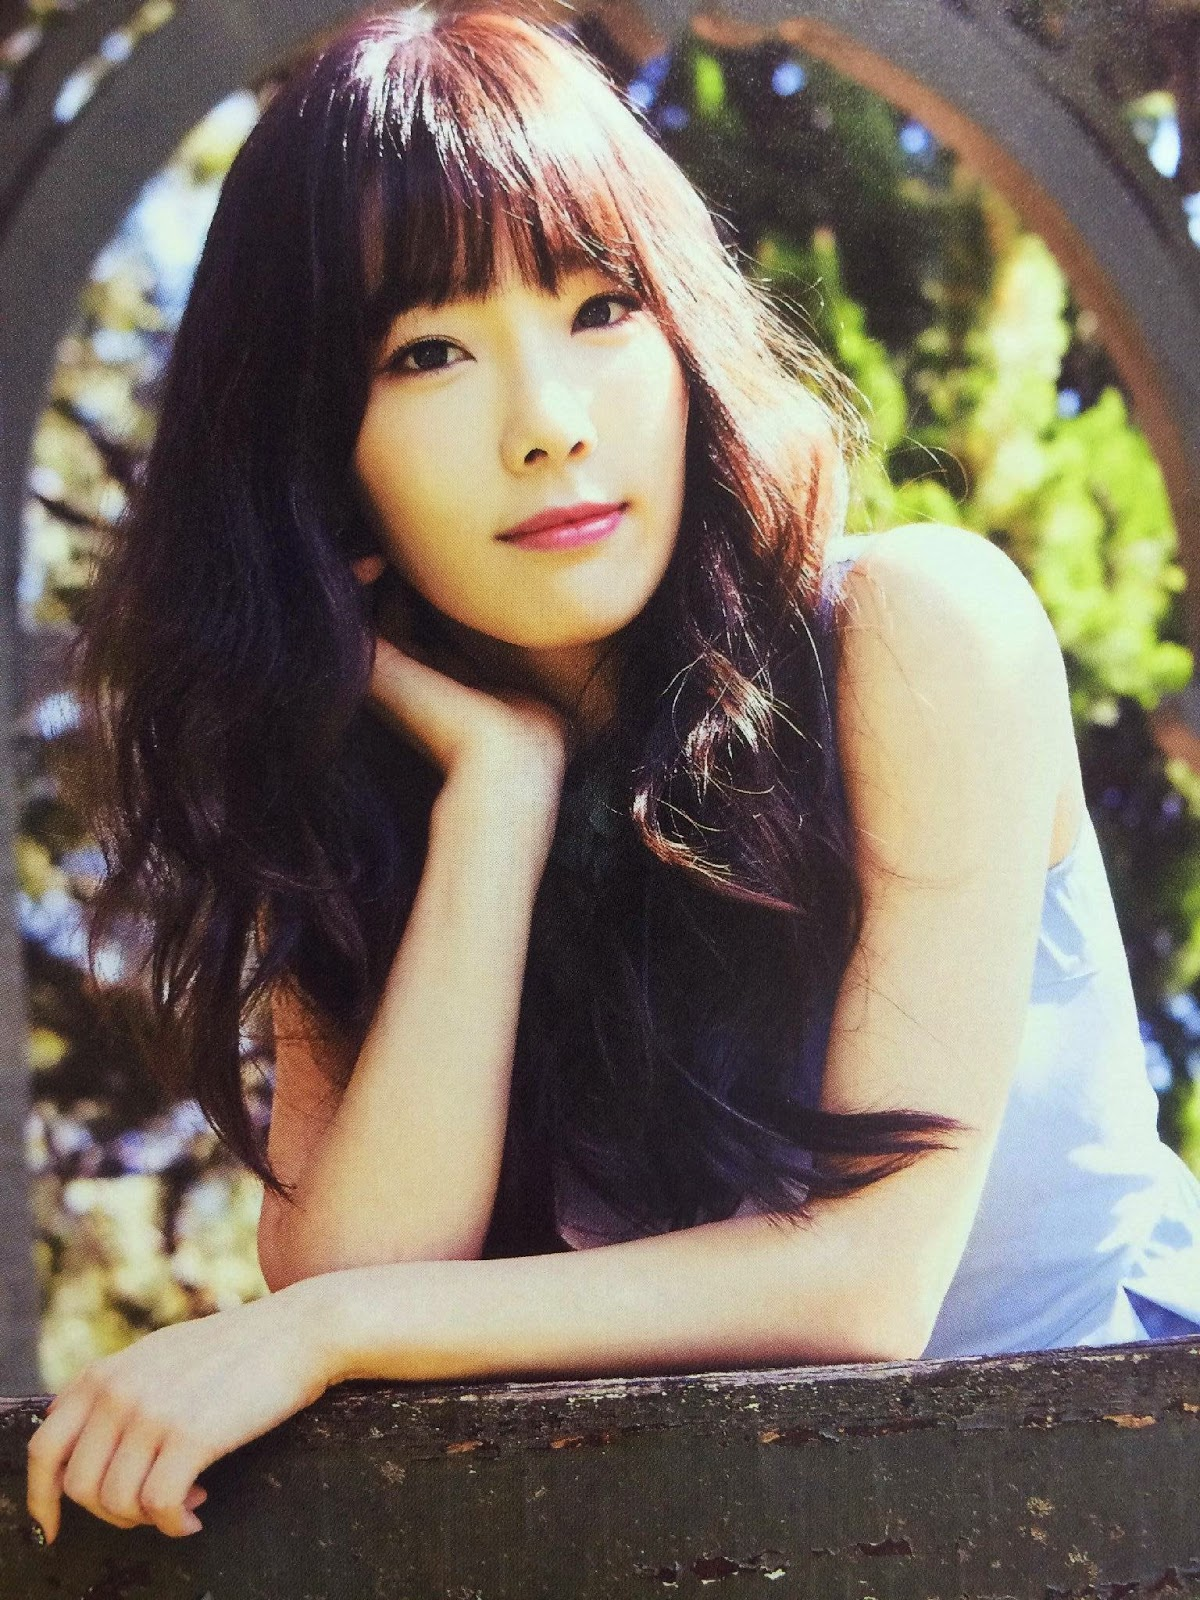 SNSD Taeyeon (태연; テヨン) Girls Generation The Best Scan Photos 5